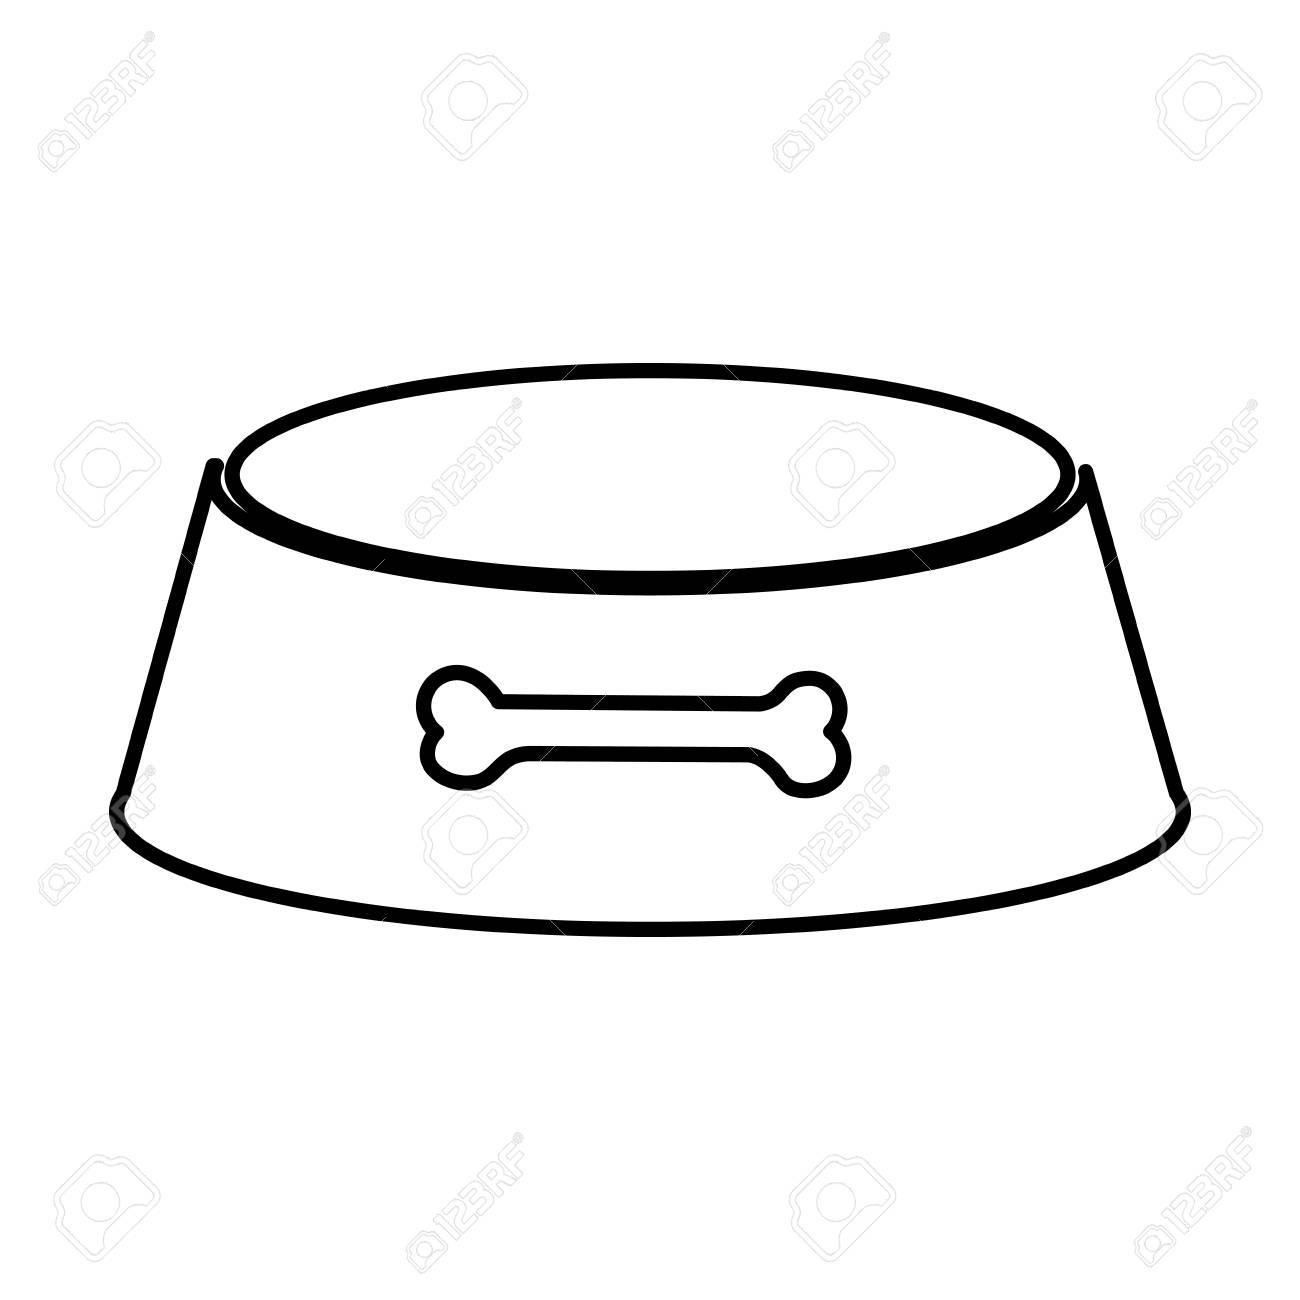 Dog Bowl Silhouette.